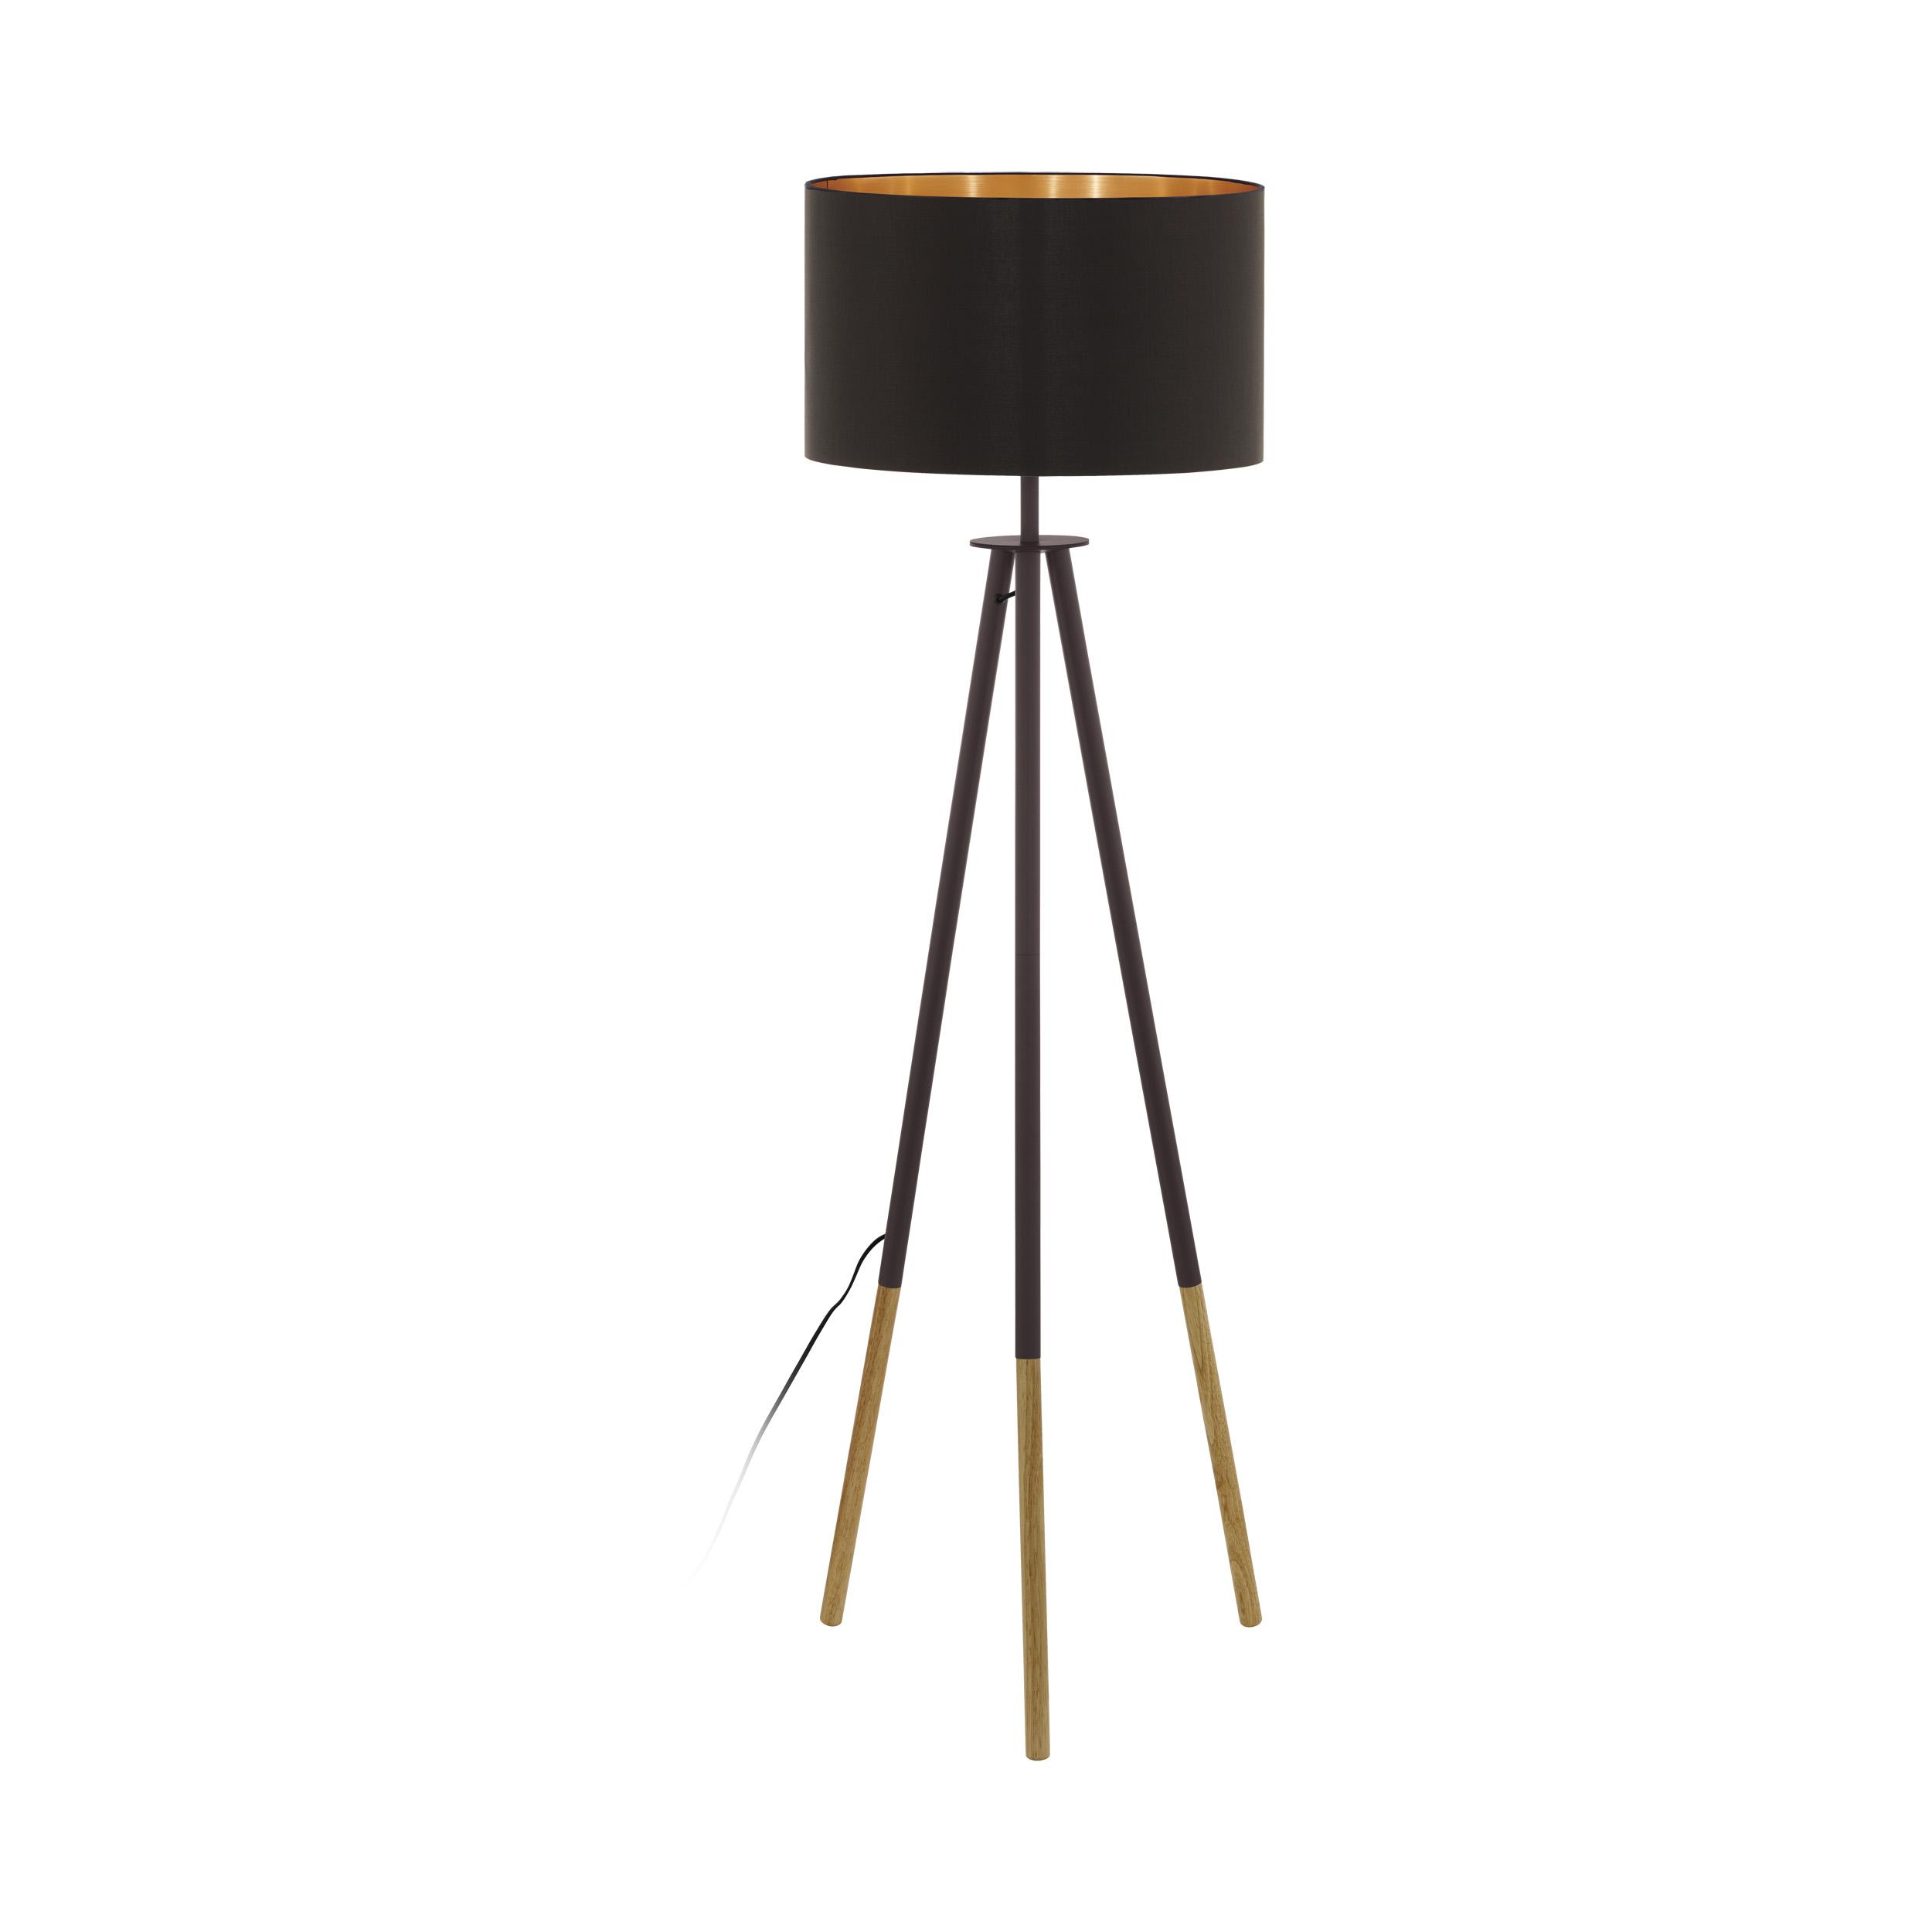 1 Stk Bidford E27 60W braun/cappucino-gold IP20 LI65014---